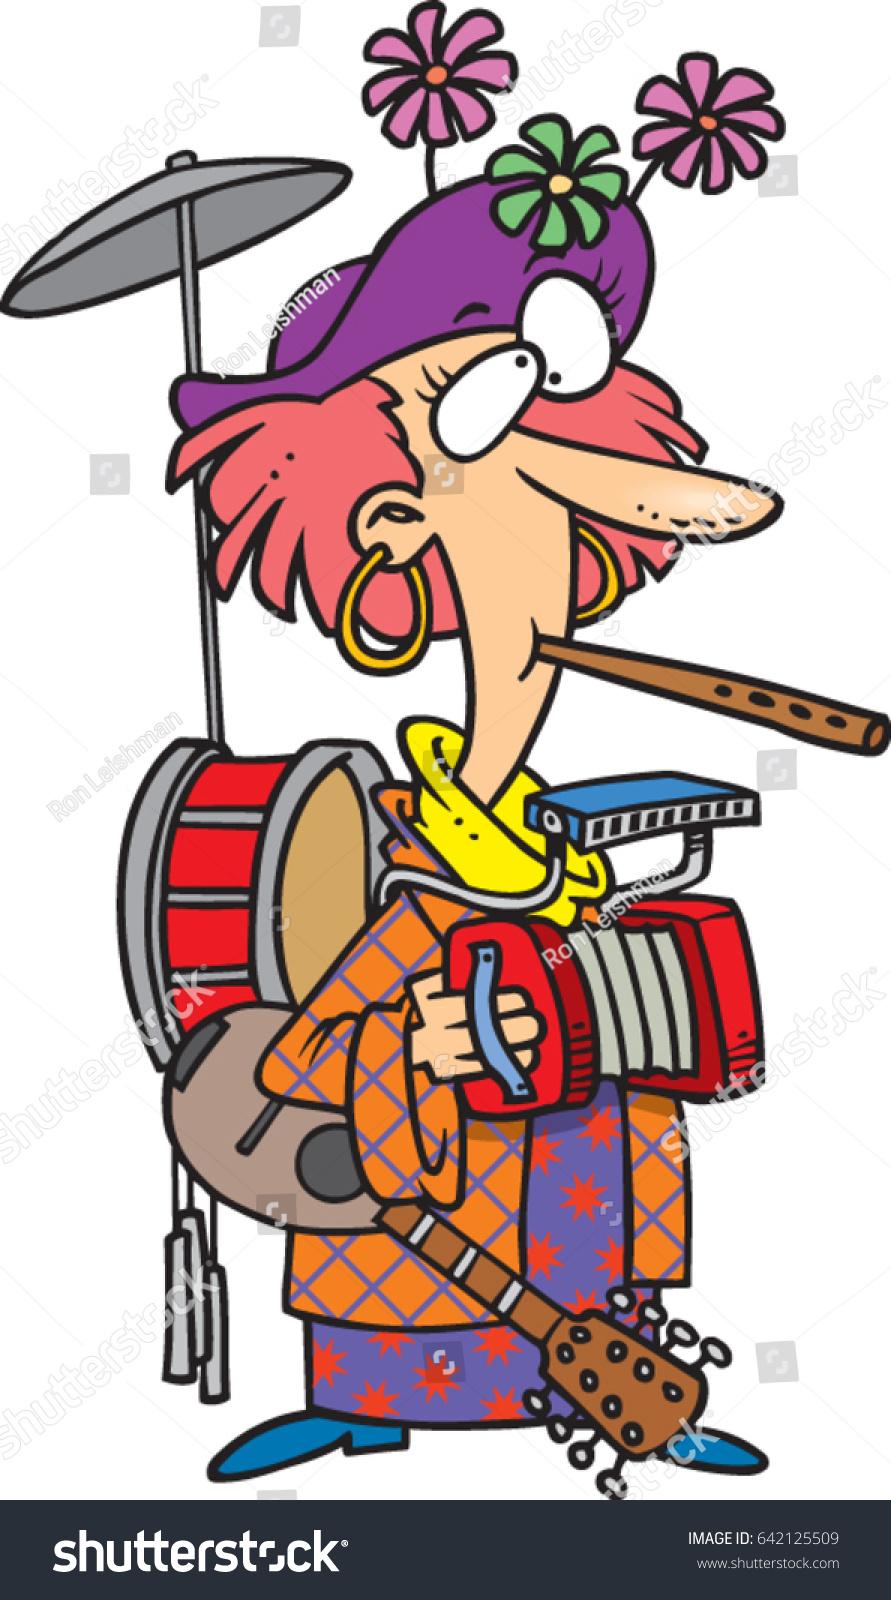 stock-vector-cartoon-one-woman-band-642125509.jpg